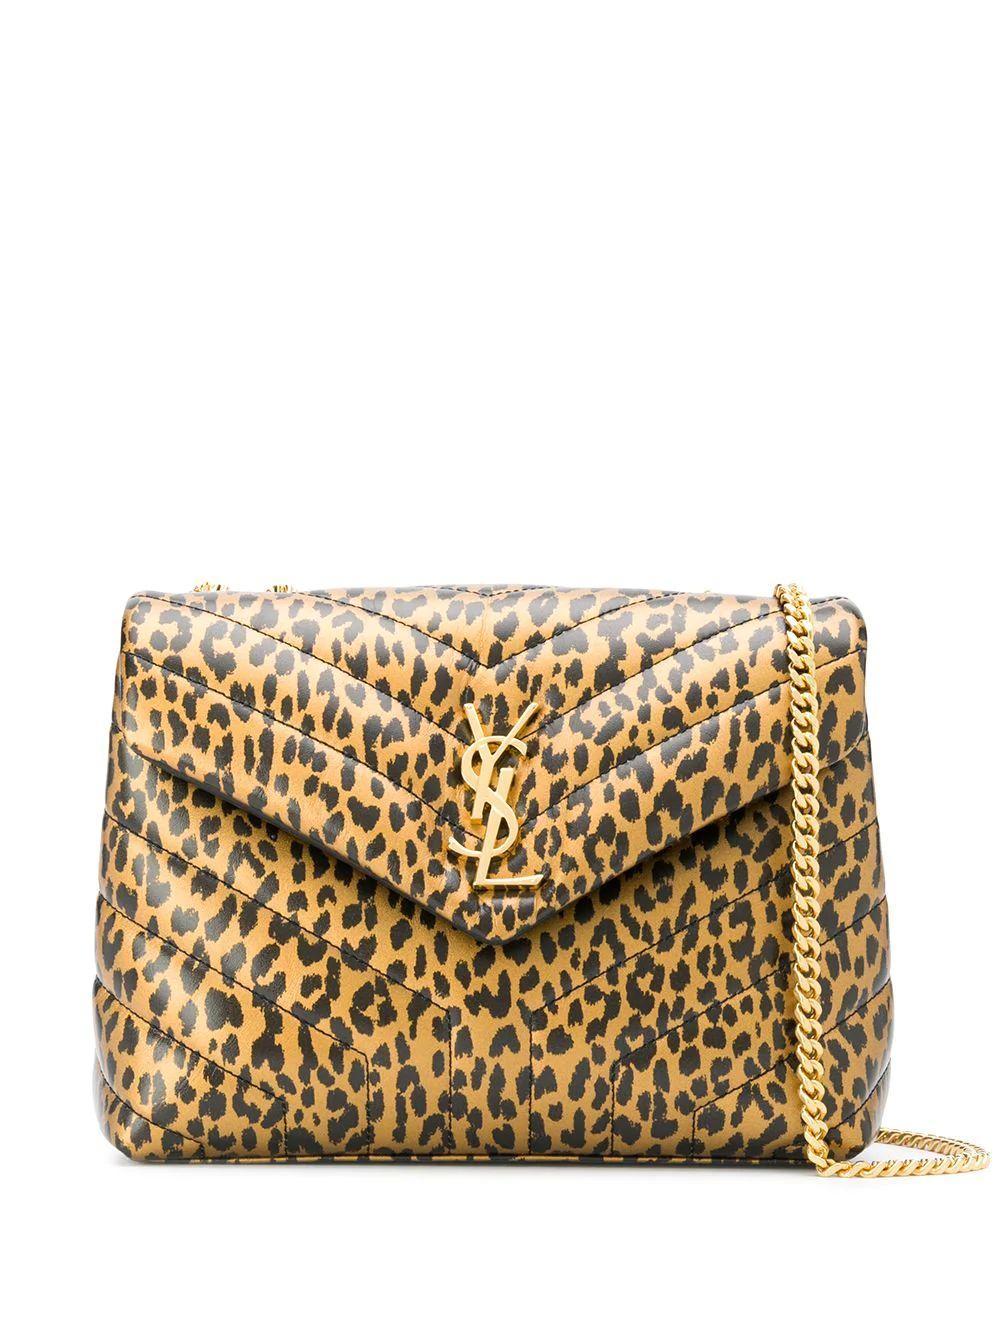 Lou Lou Leopard Bag